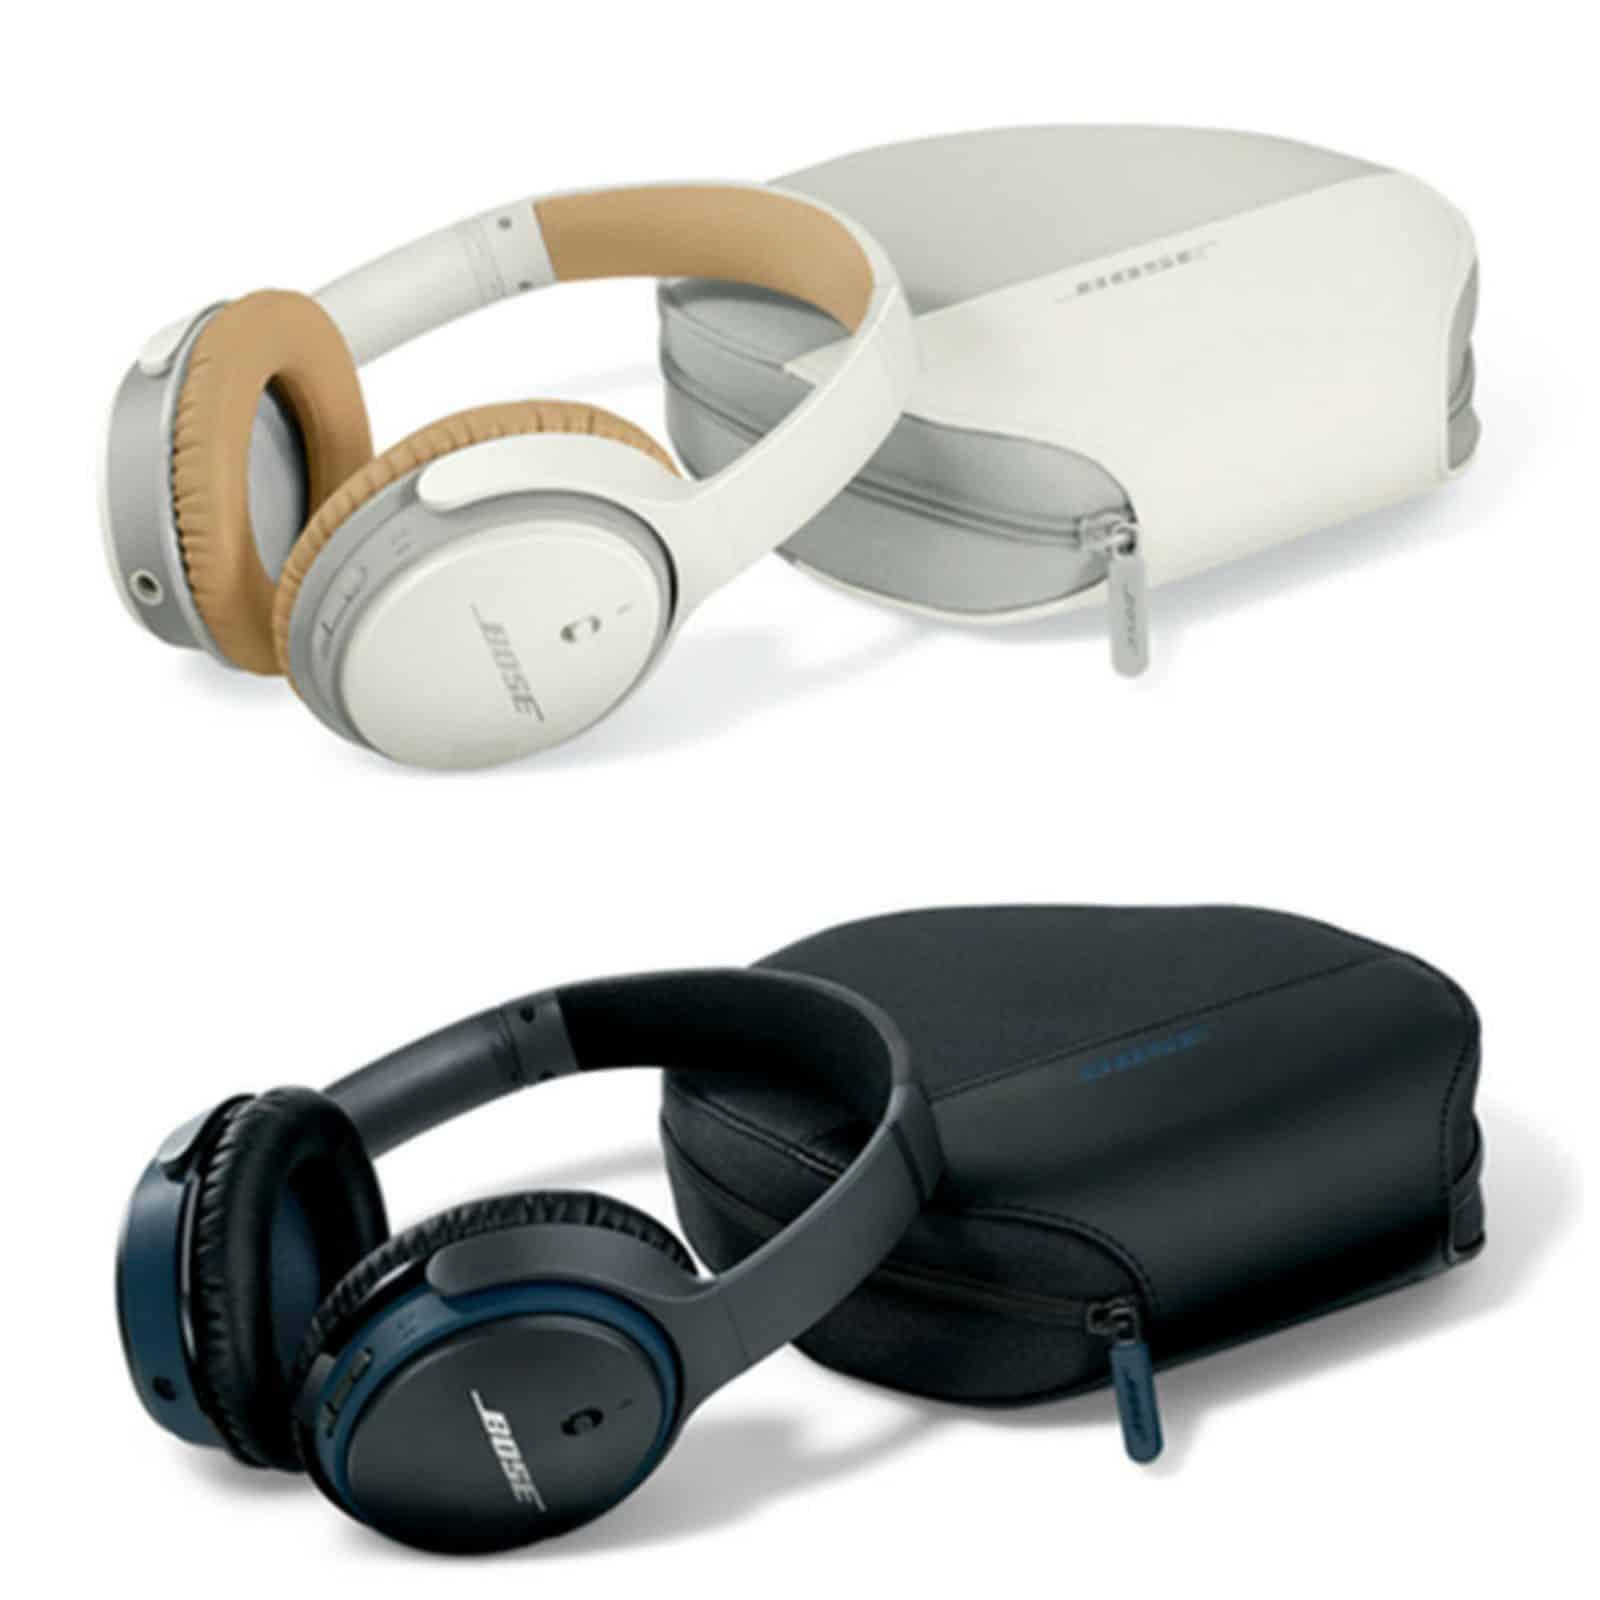 Bose Soundlink Headphones II Collage